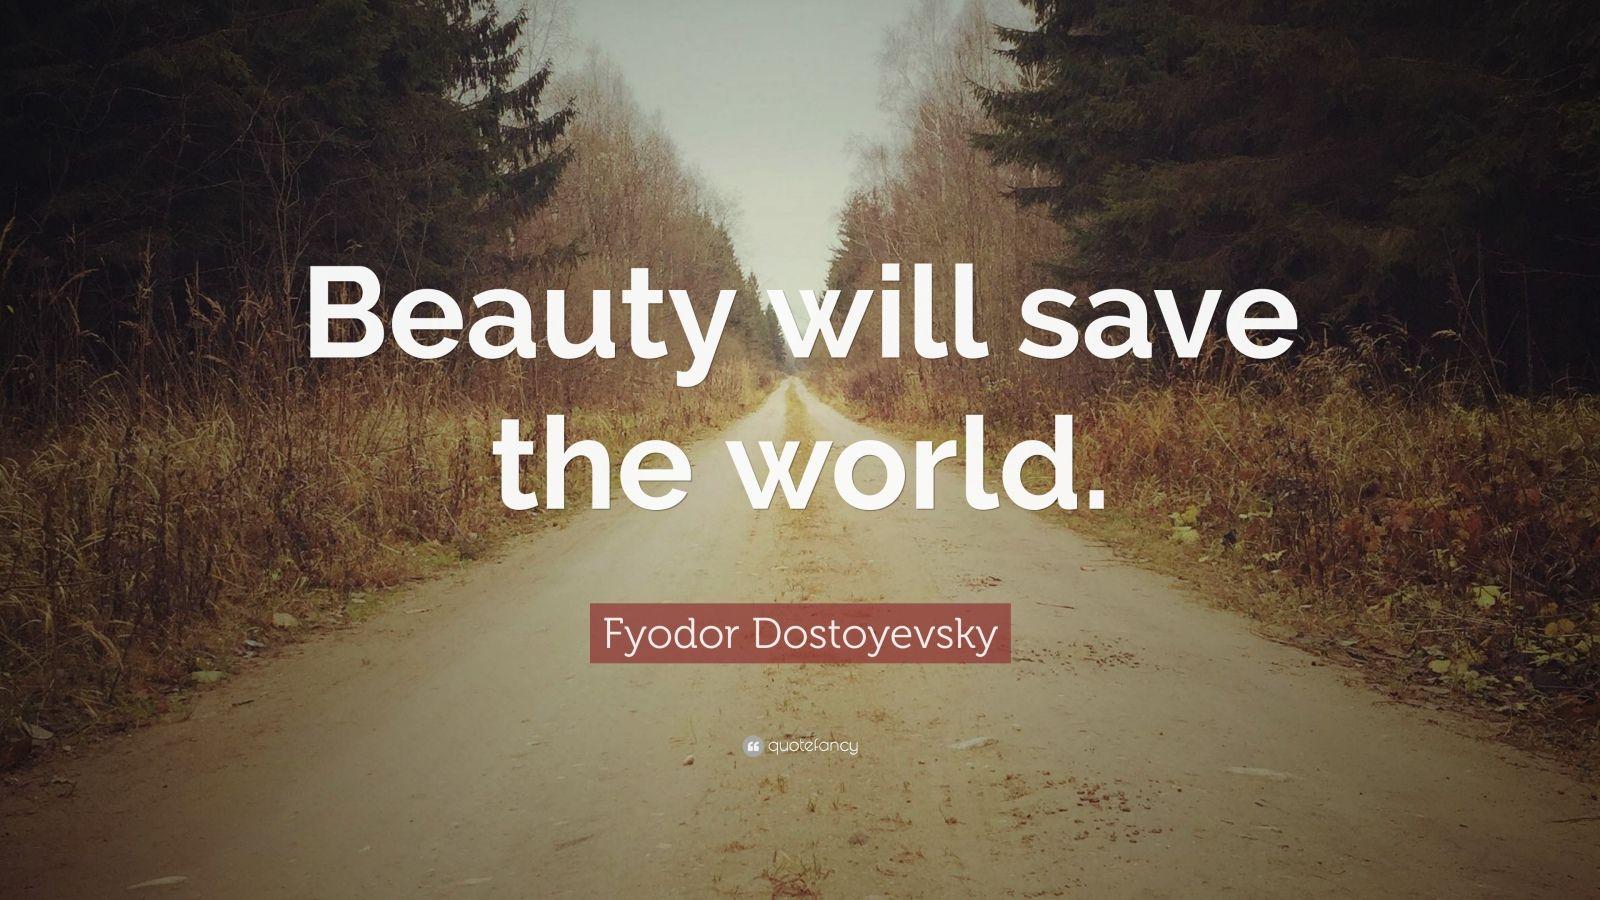 Fyodor Dostoyevsky Quote: Beauty will save the world